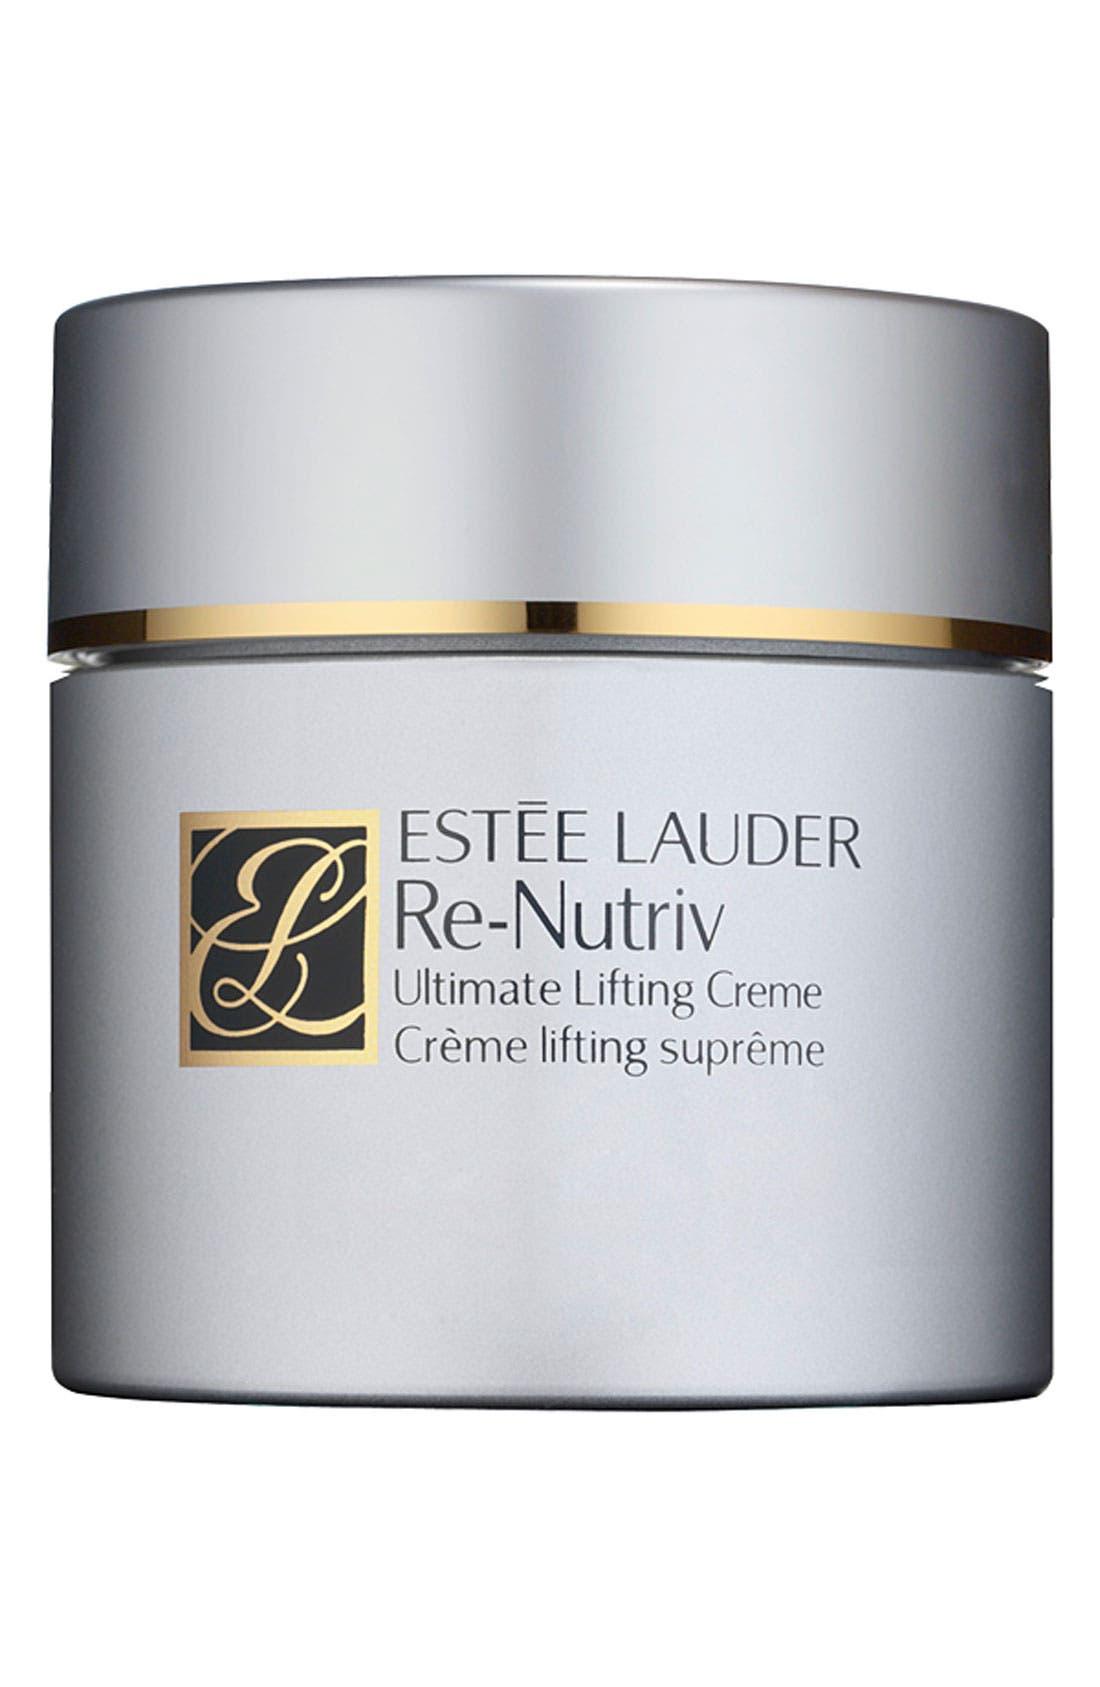 Estée Lauder 'Re-Nutriv' Ultimate Lifting Creme (Large Size) ($1,235 Value)